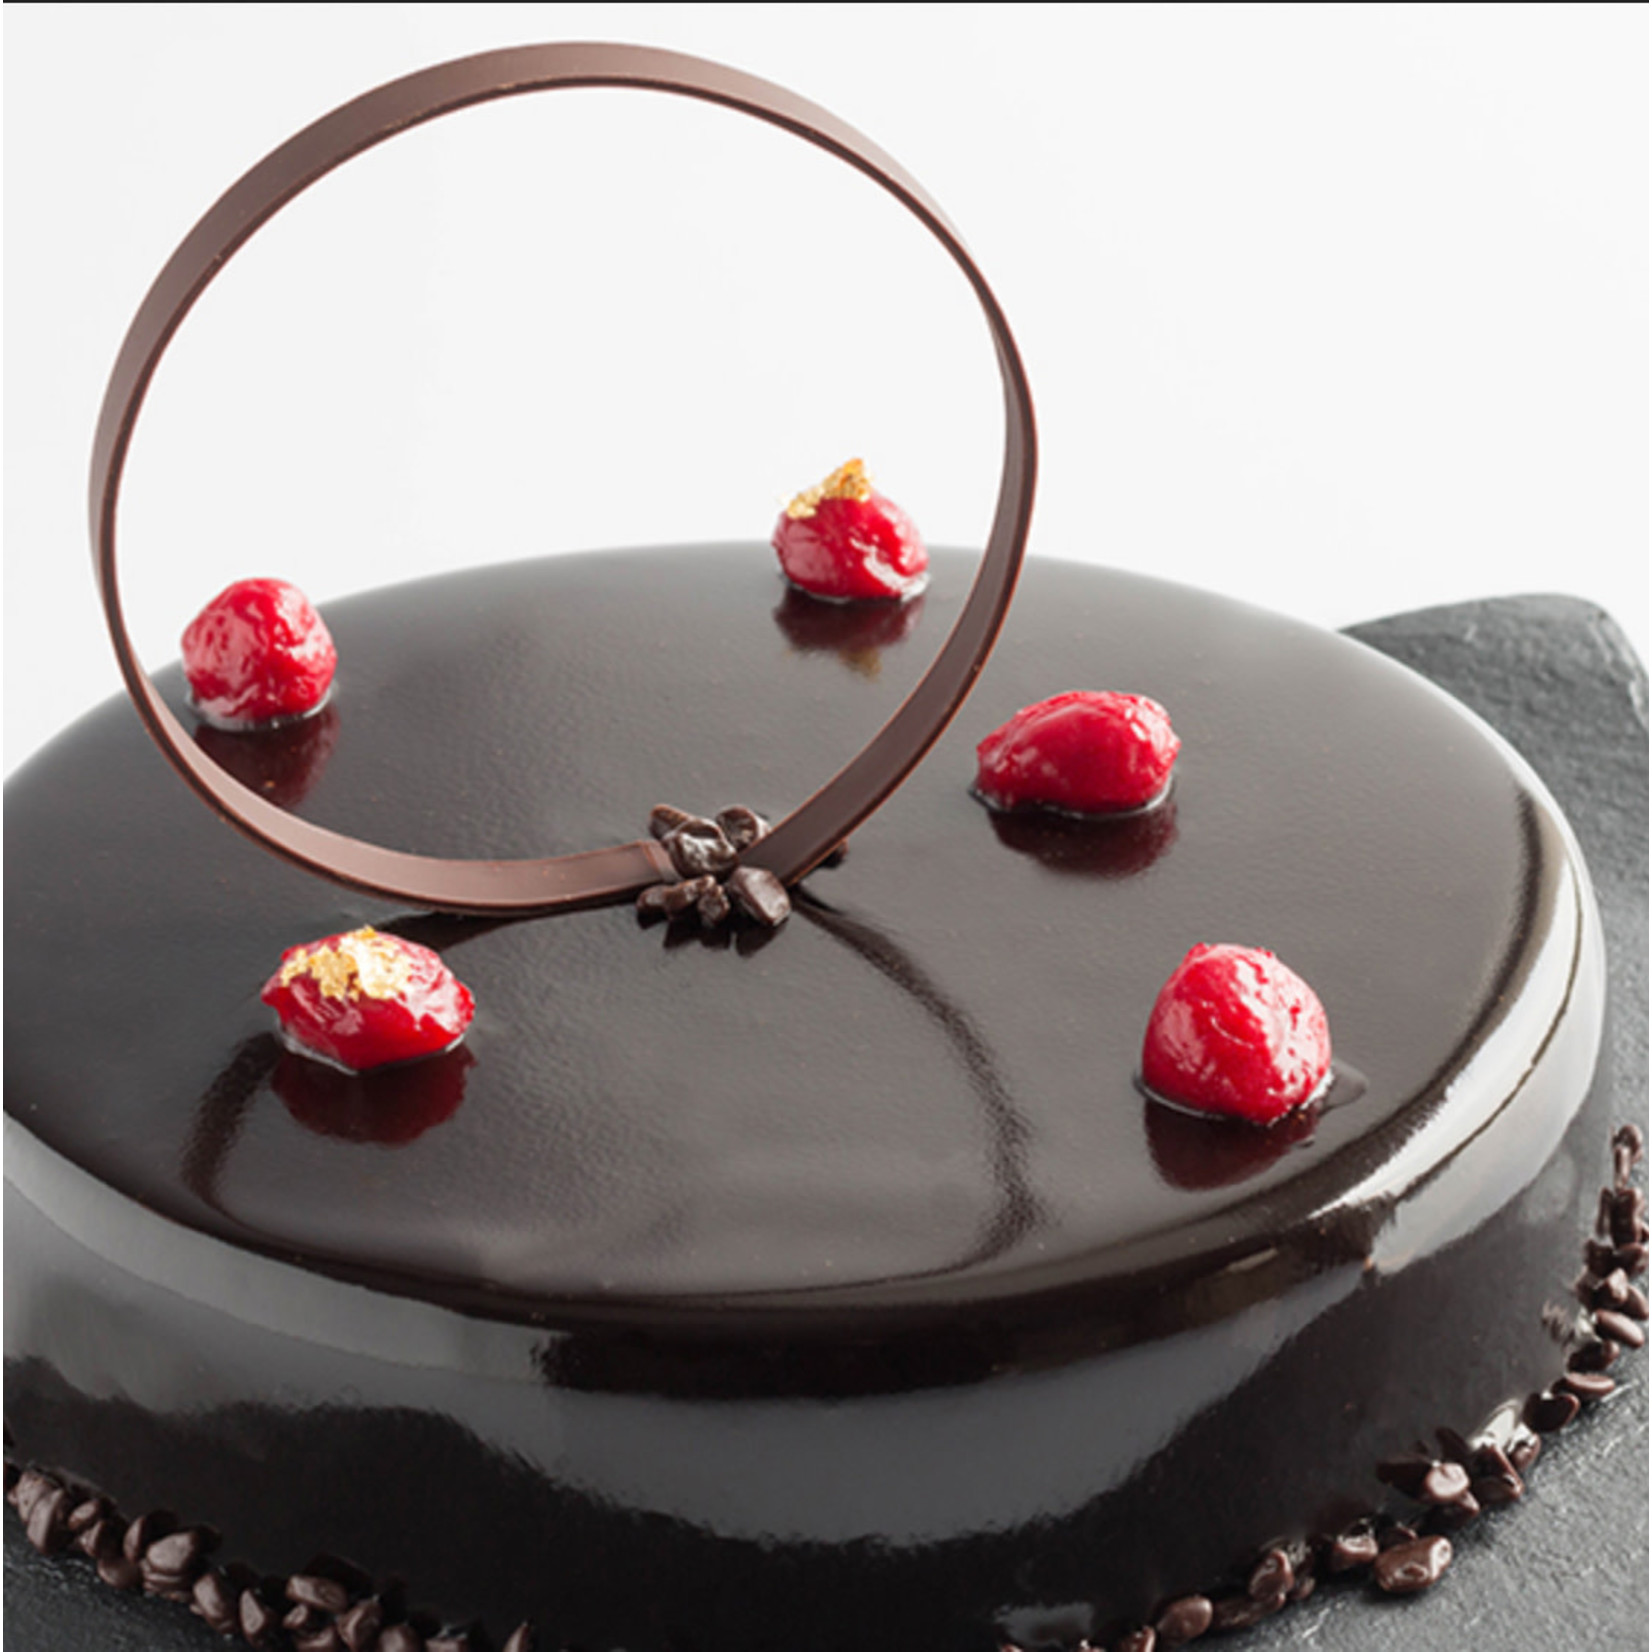 Irca Irca - Mirror Glaze, Dark Chocolate 6kg/13.2lb - 01030222